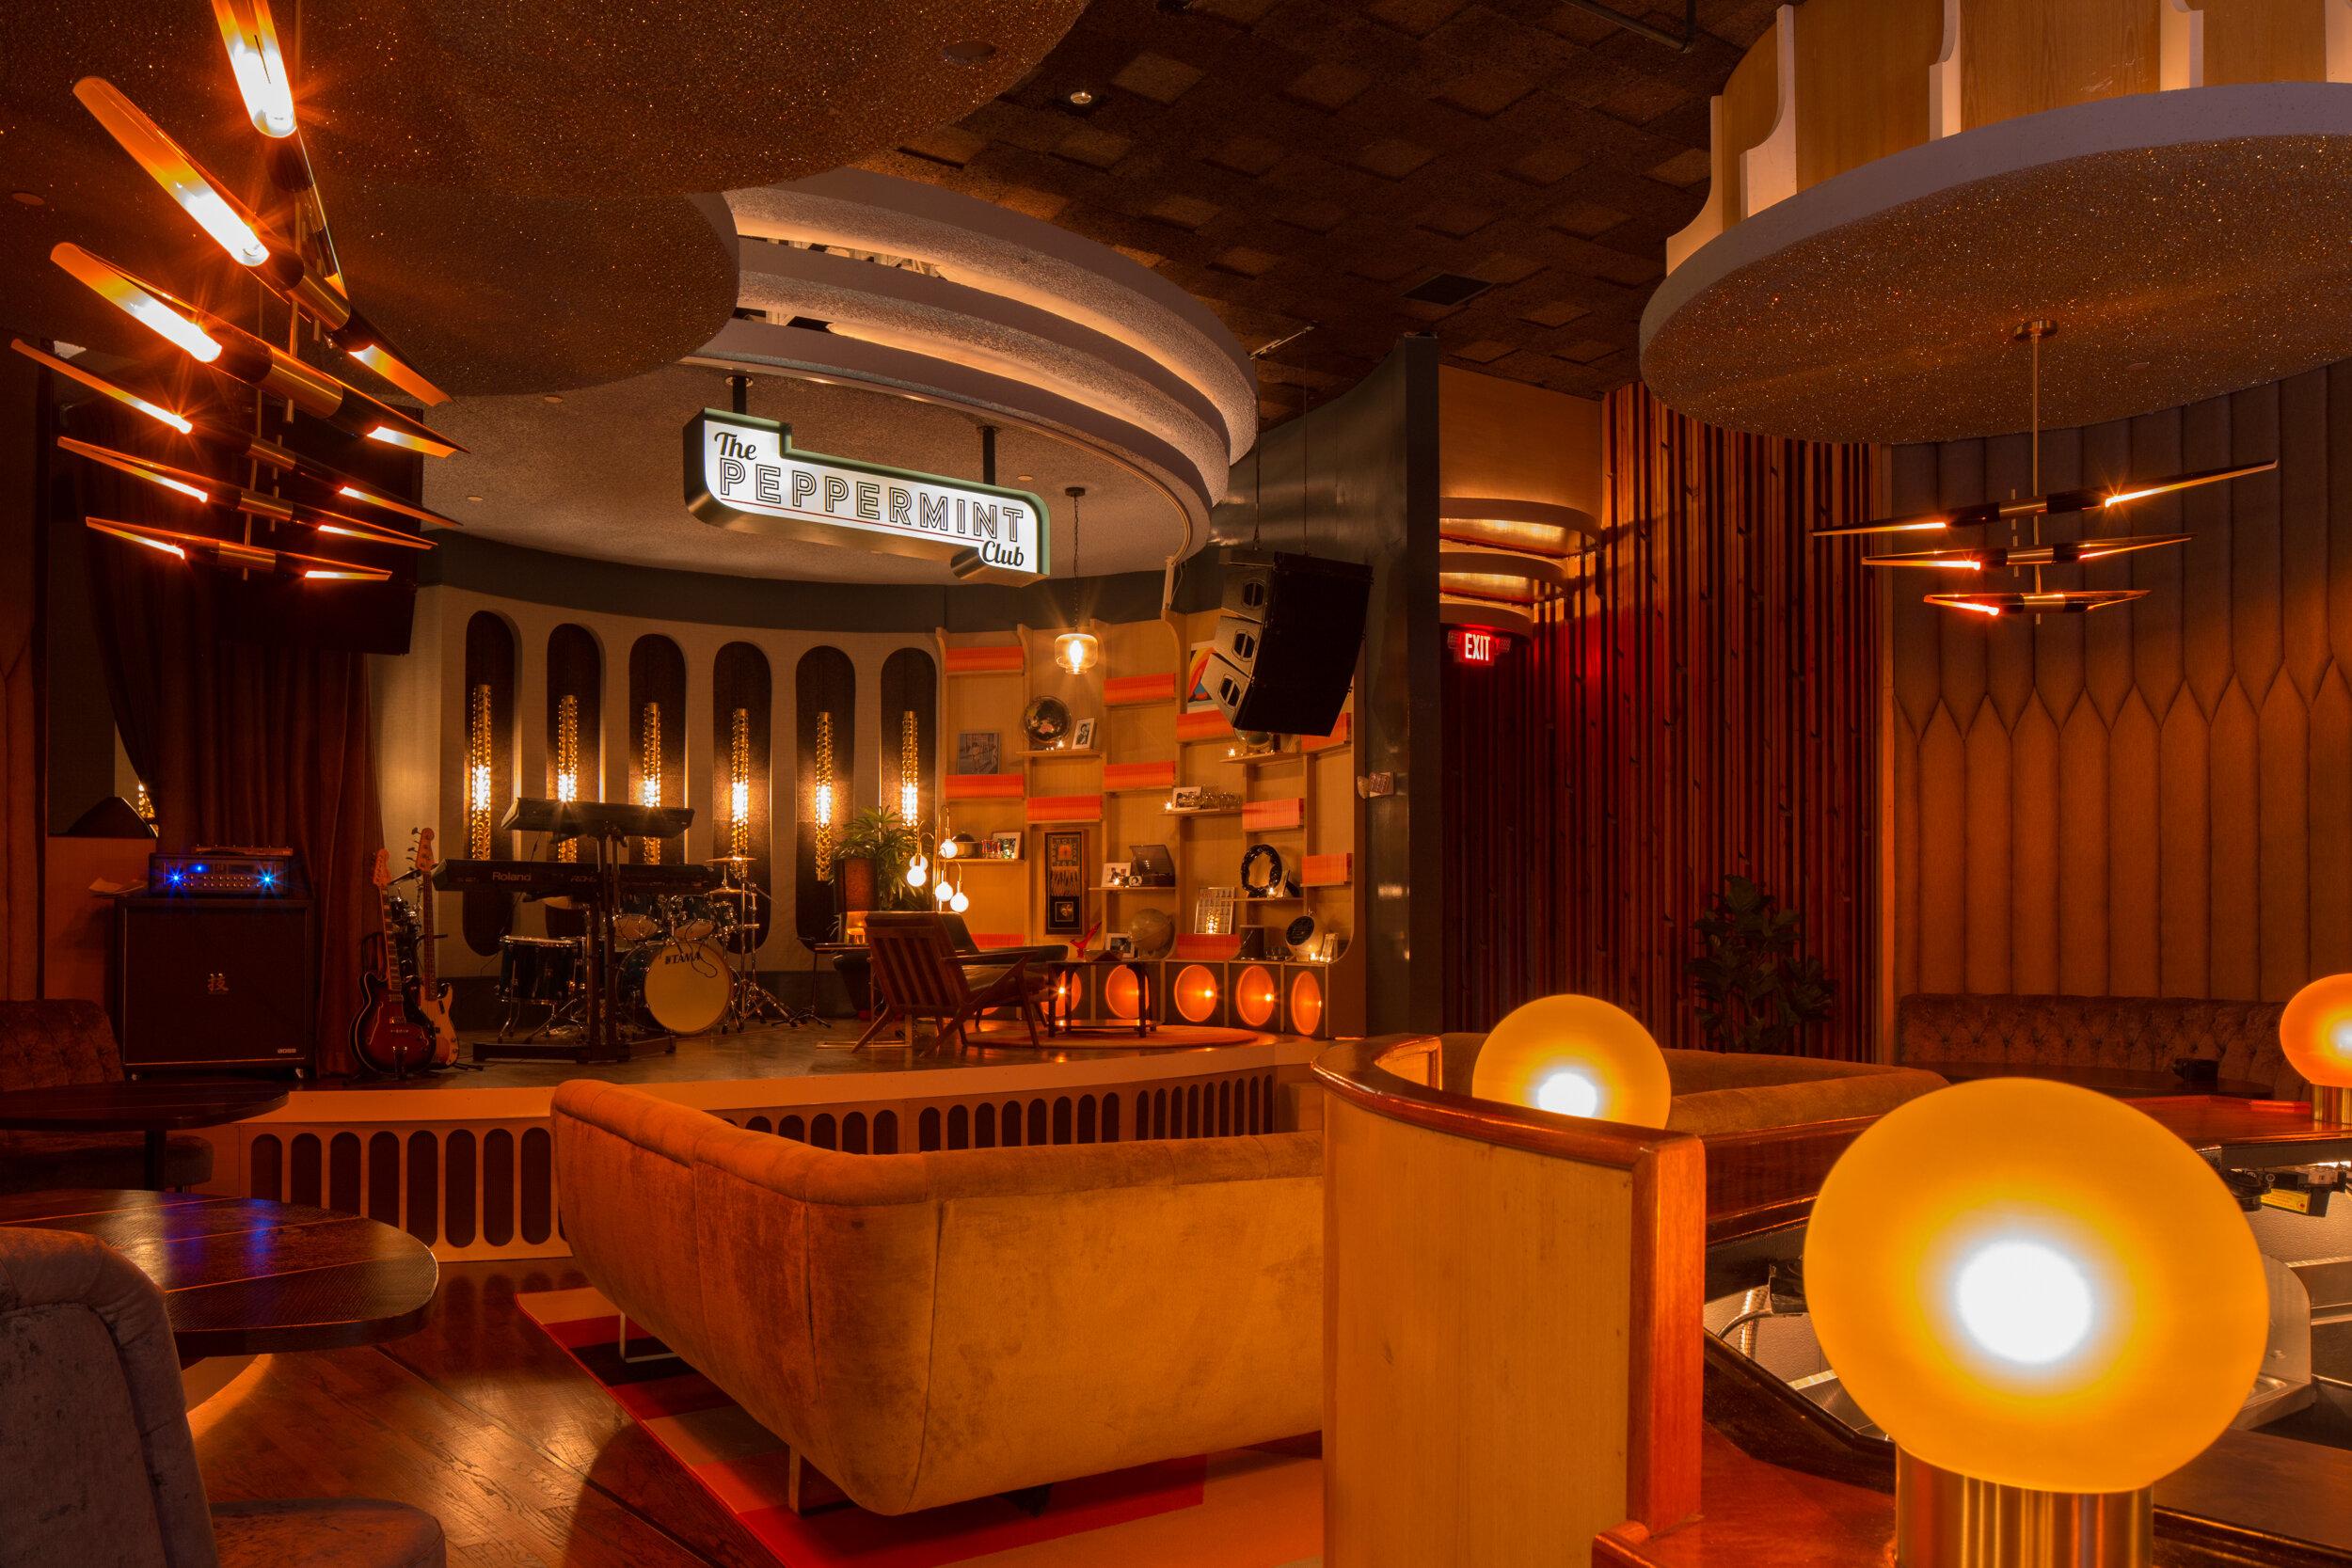 Tribeca Strip Club New York Dolls Won't Be Closing After All